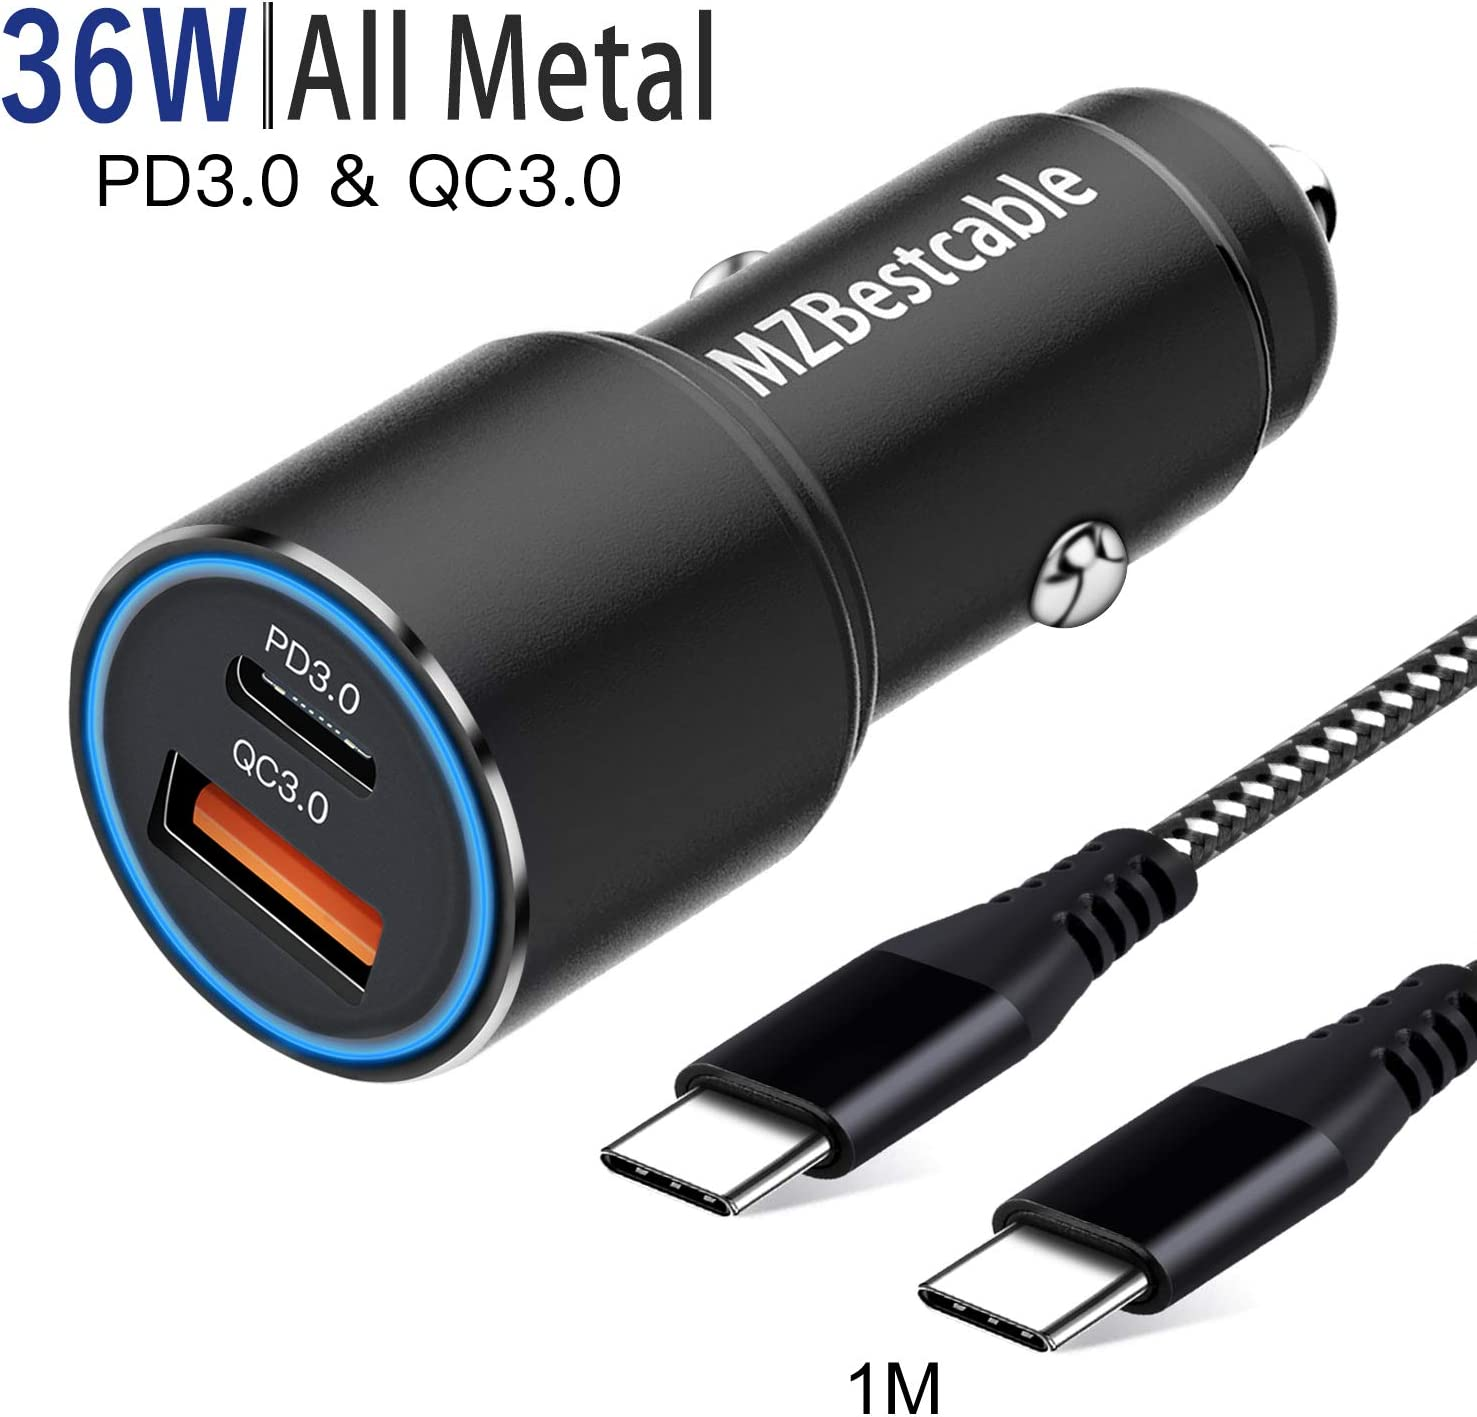 Cargador Coche USB Tipo C PD3.0+QC3.0 para Samsung S10 S20 Plus Ultra S9 S8,A71 A70 A51 A50 A80 A41 A31 A80,Note 20 10,XIaomi Redmi Note 9 Pro 8 8T,Mi 10,Huawei P30 Lite+1M C to C Cable,Carga Rapida